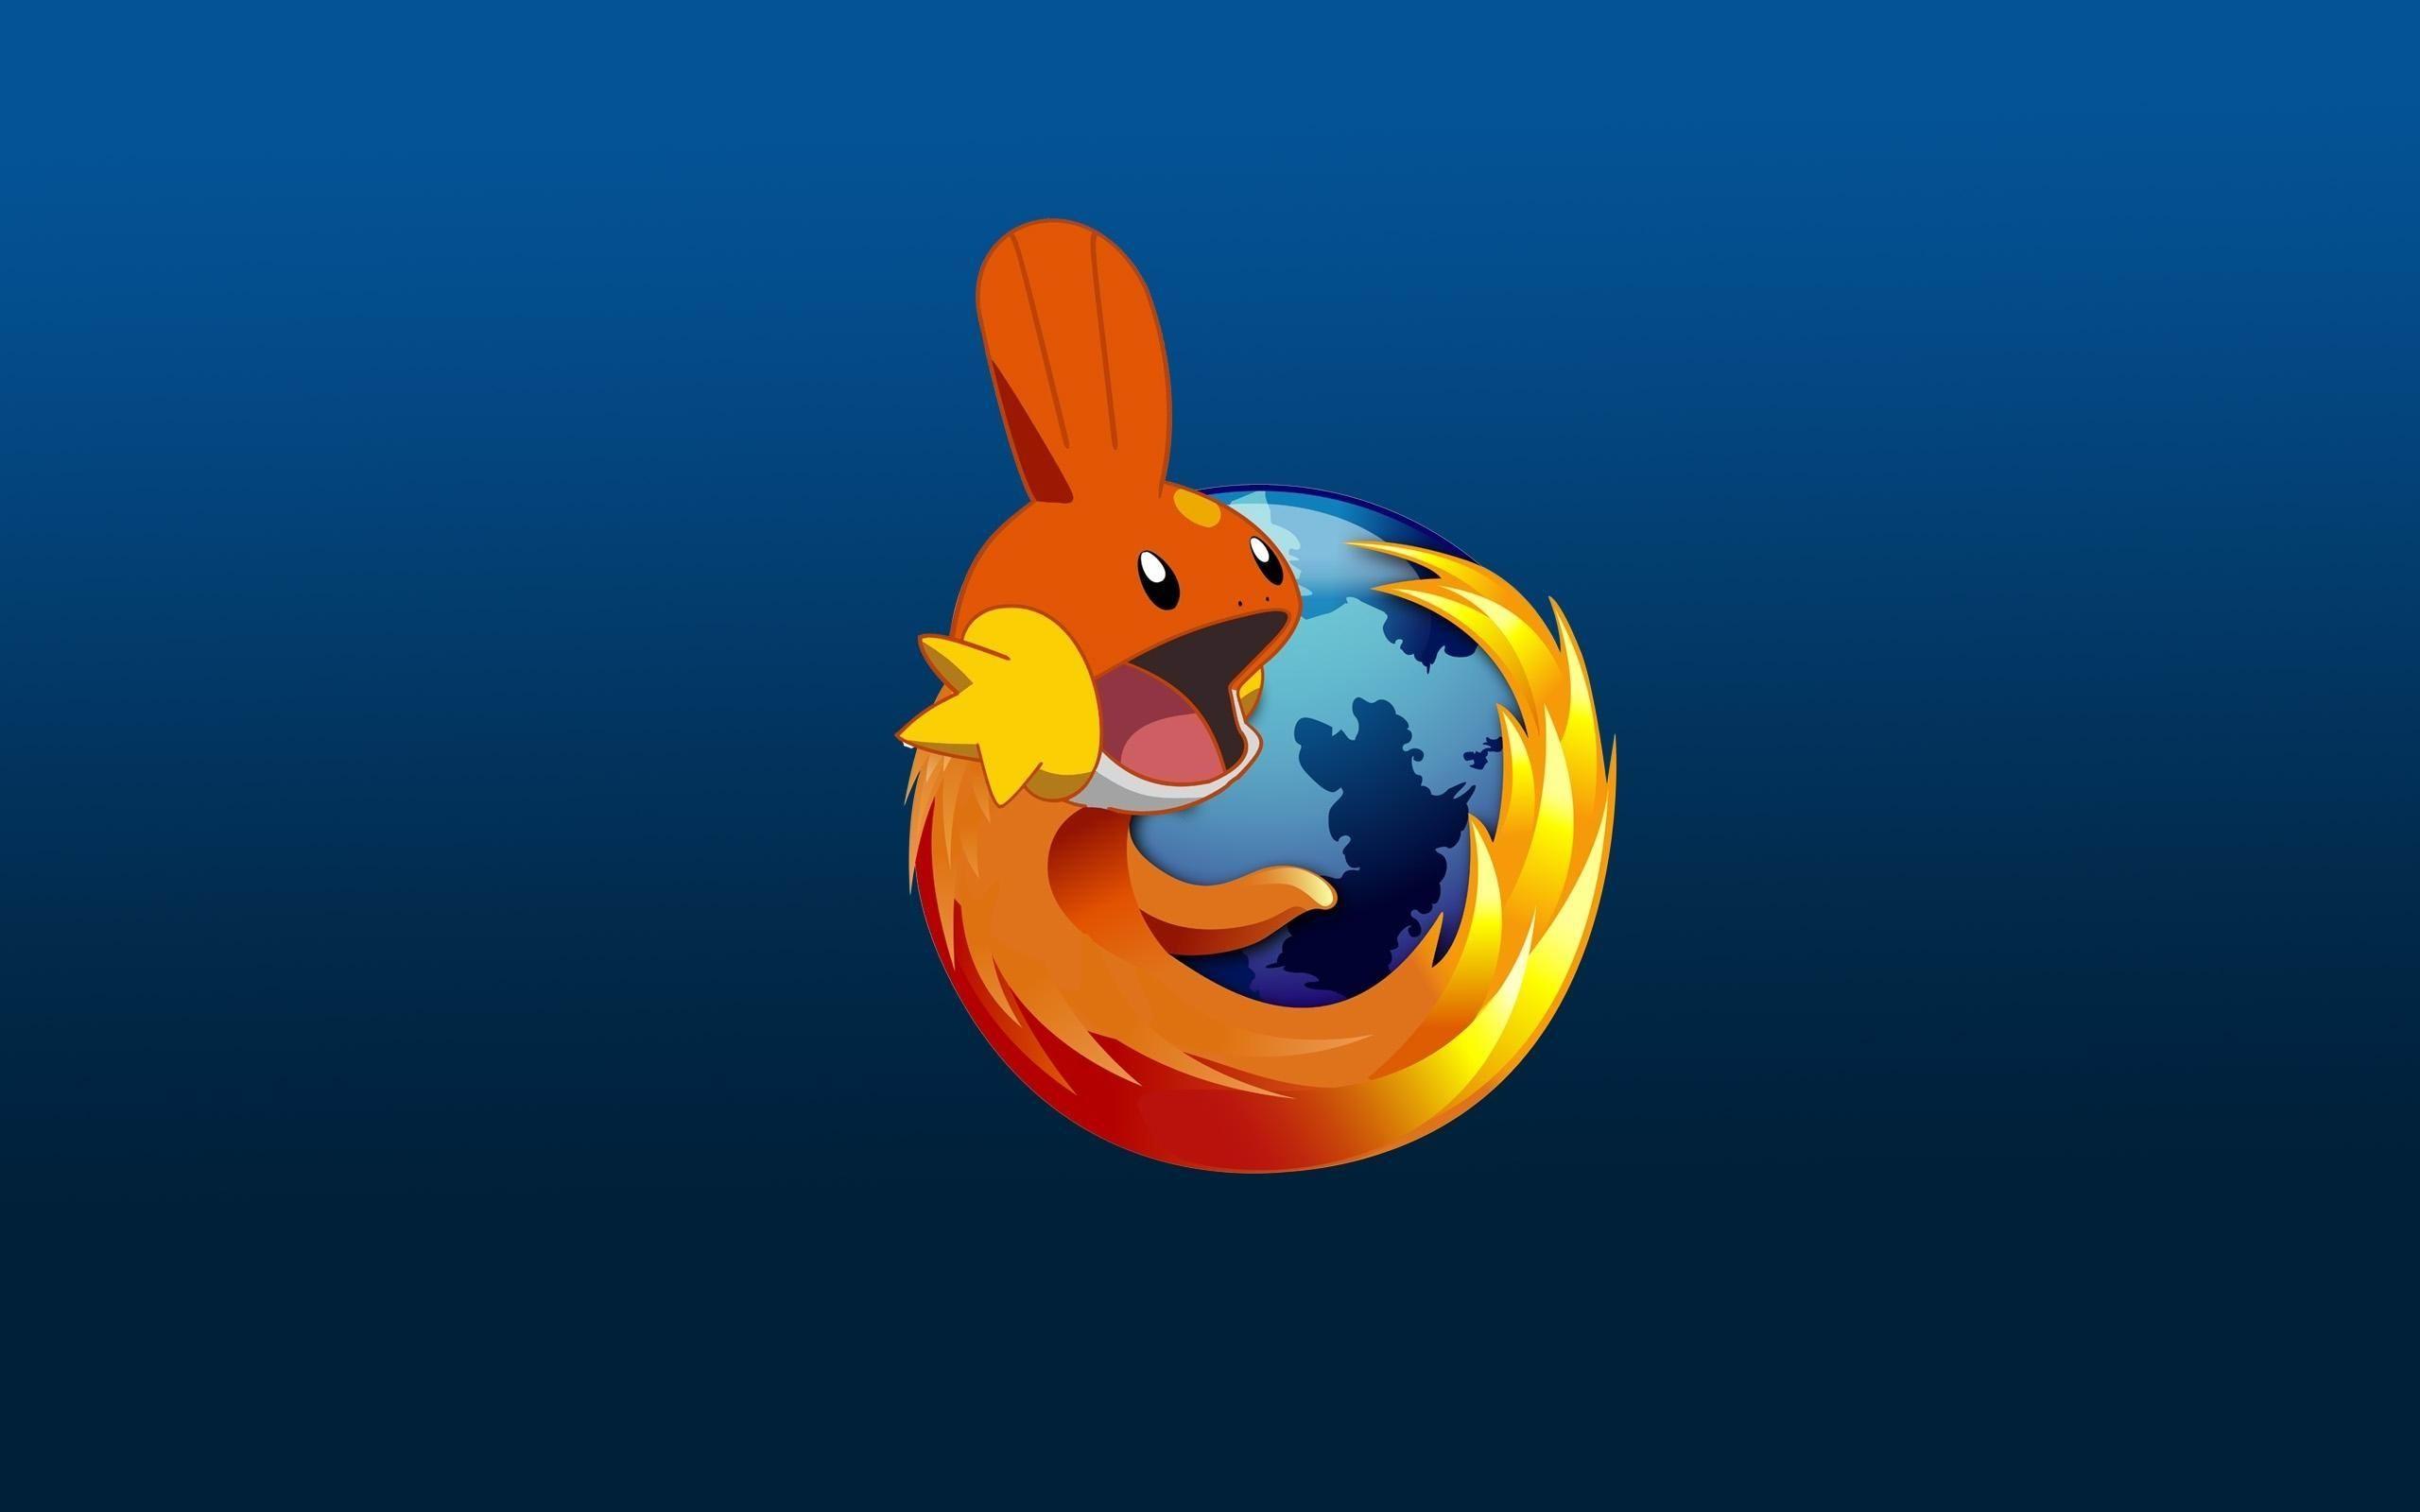 Firefox Pokemon Fond D Ecran Publicitaire De La Marque Apercu 10wallpaper Com